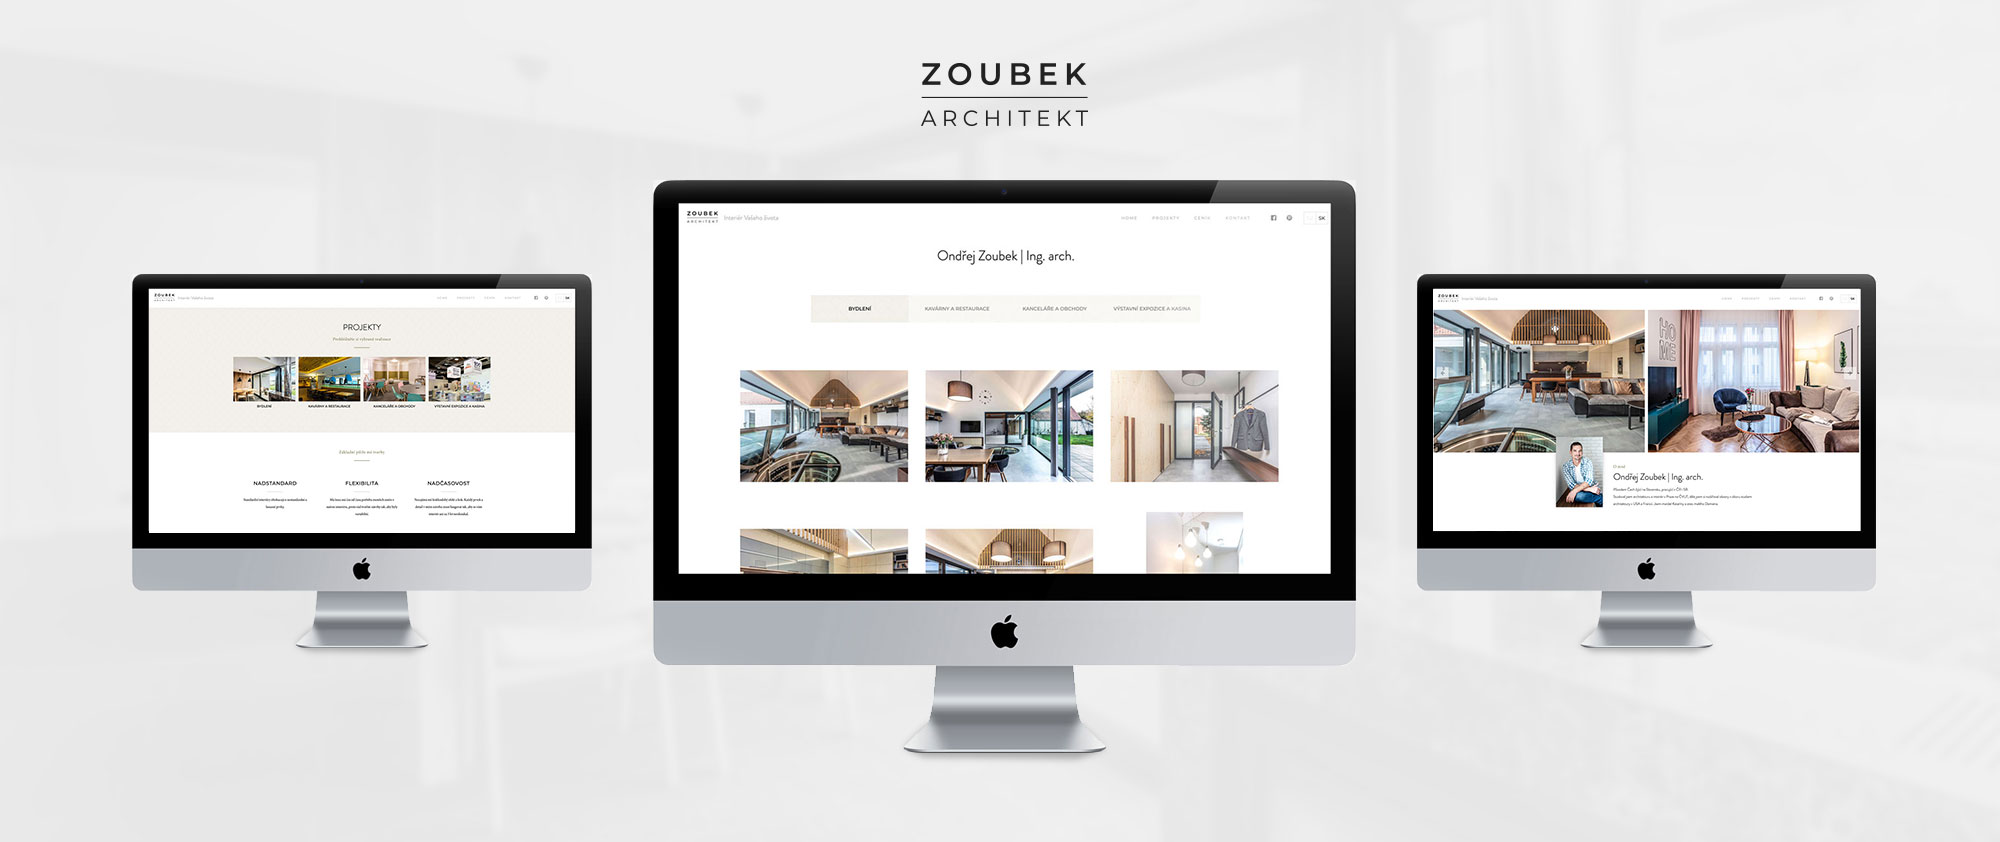 Architect's website